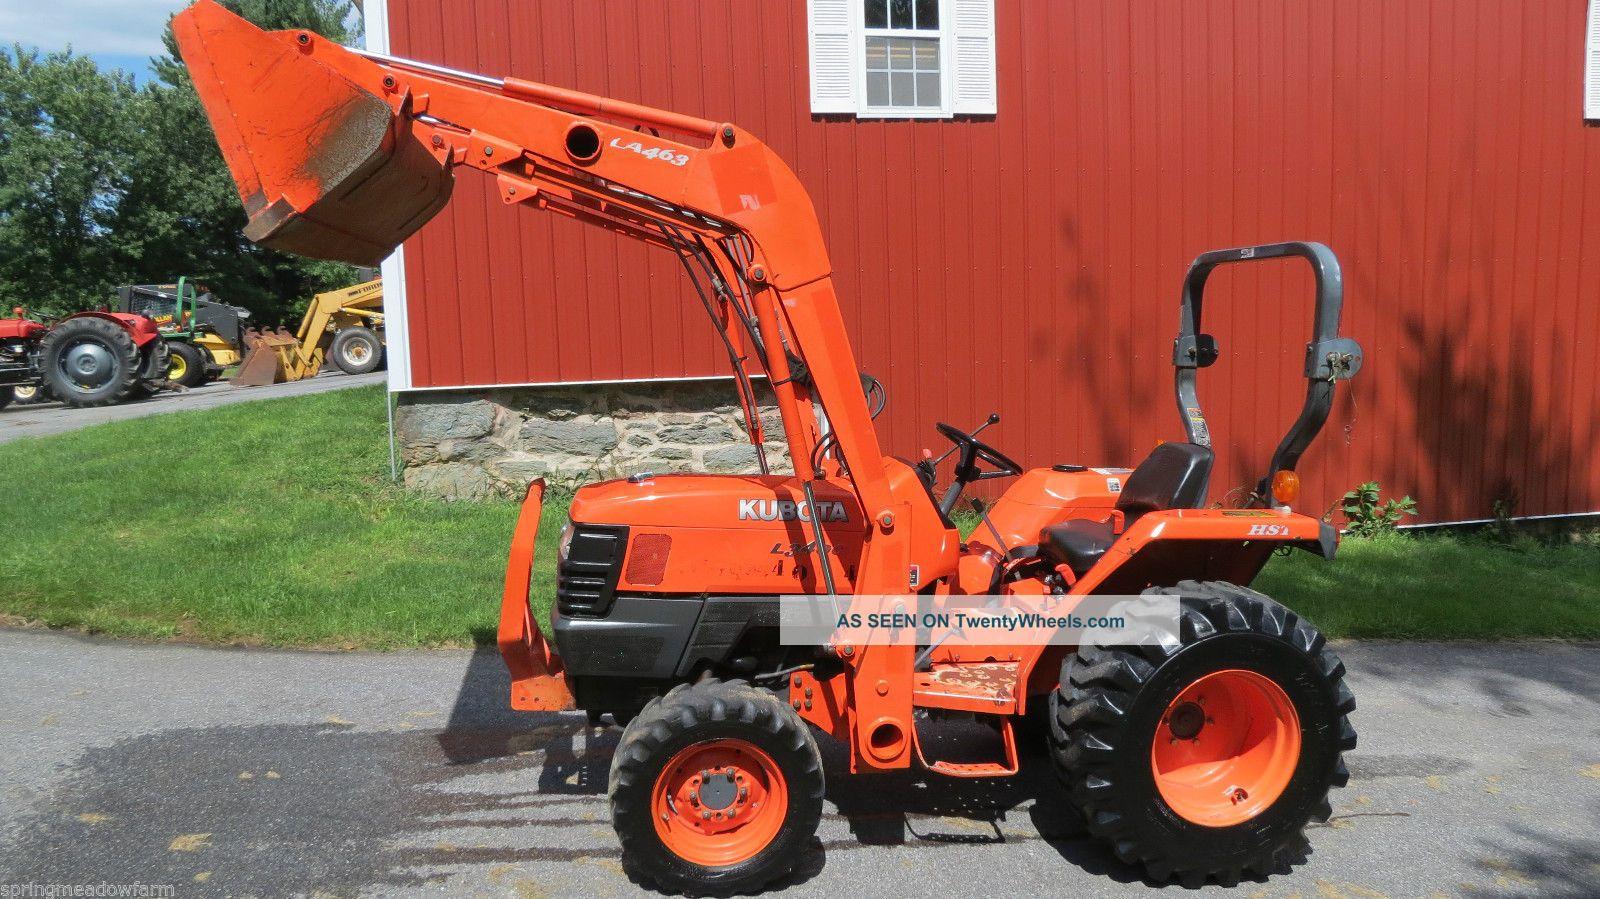 2007 Kubota L3400 4x4 Hydrostatic Compact Loader Tractor